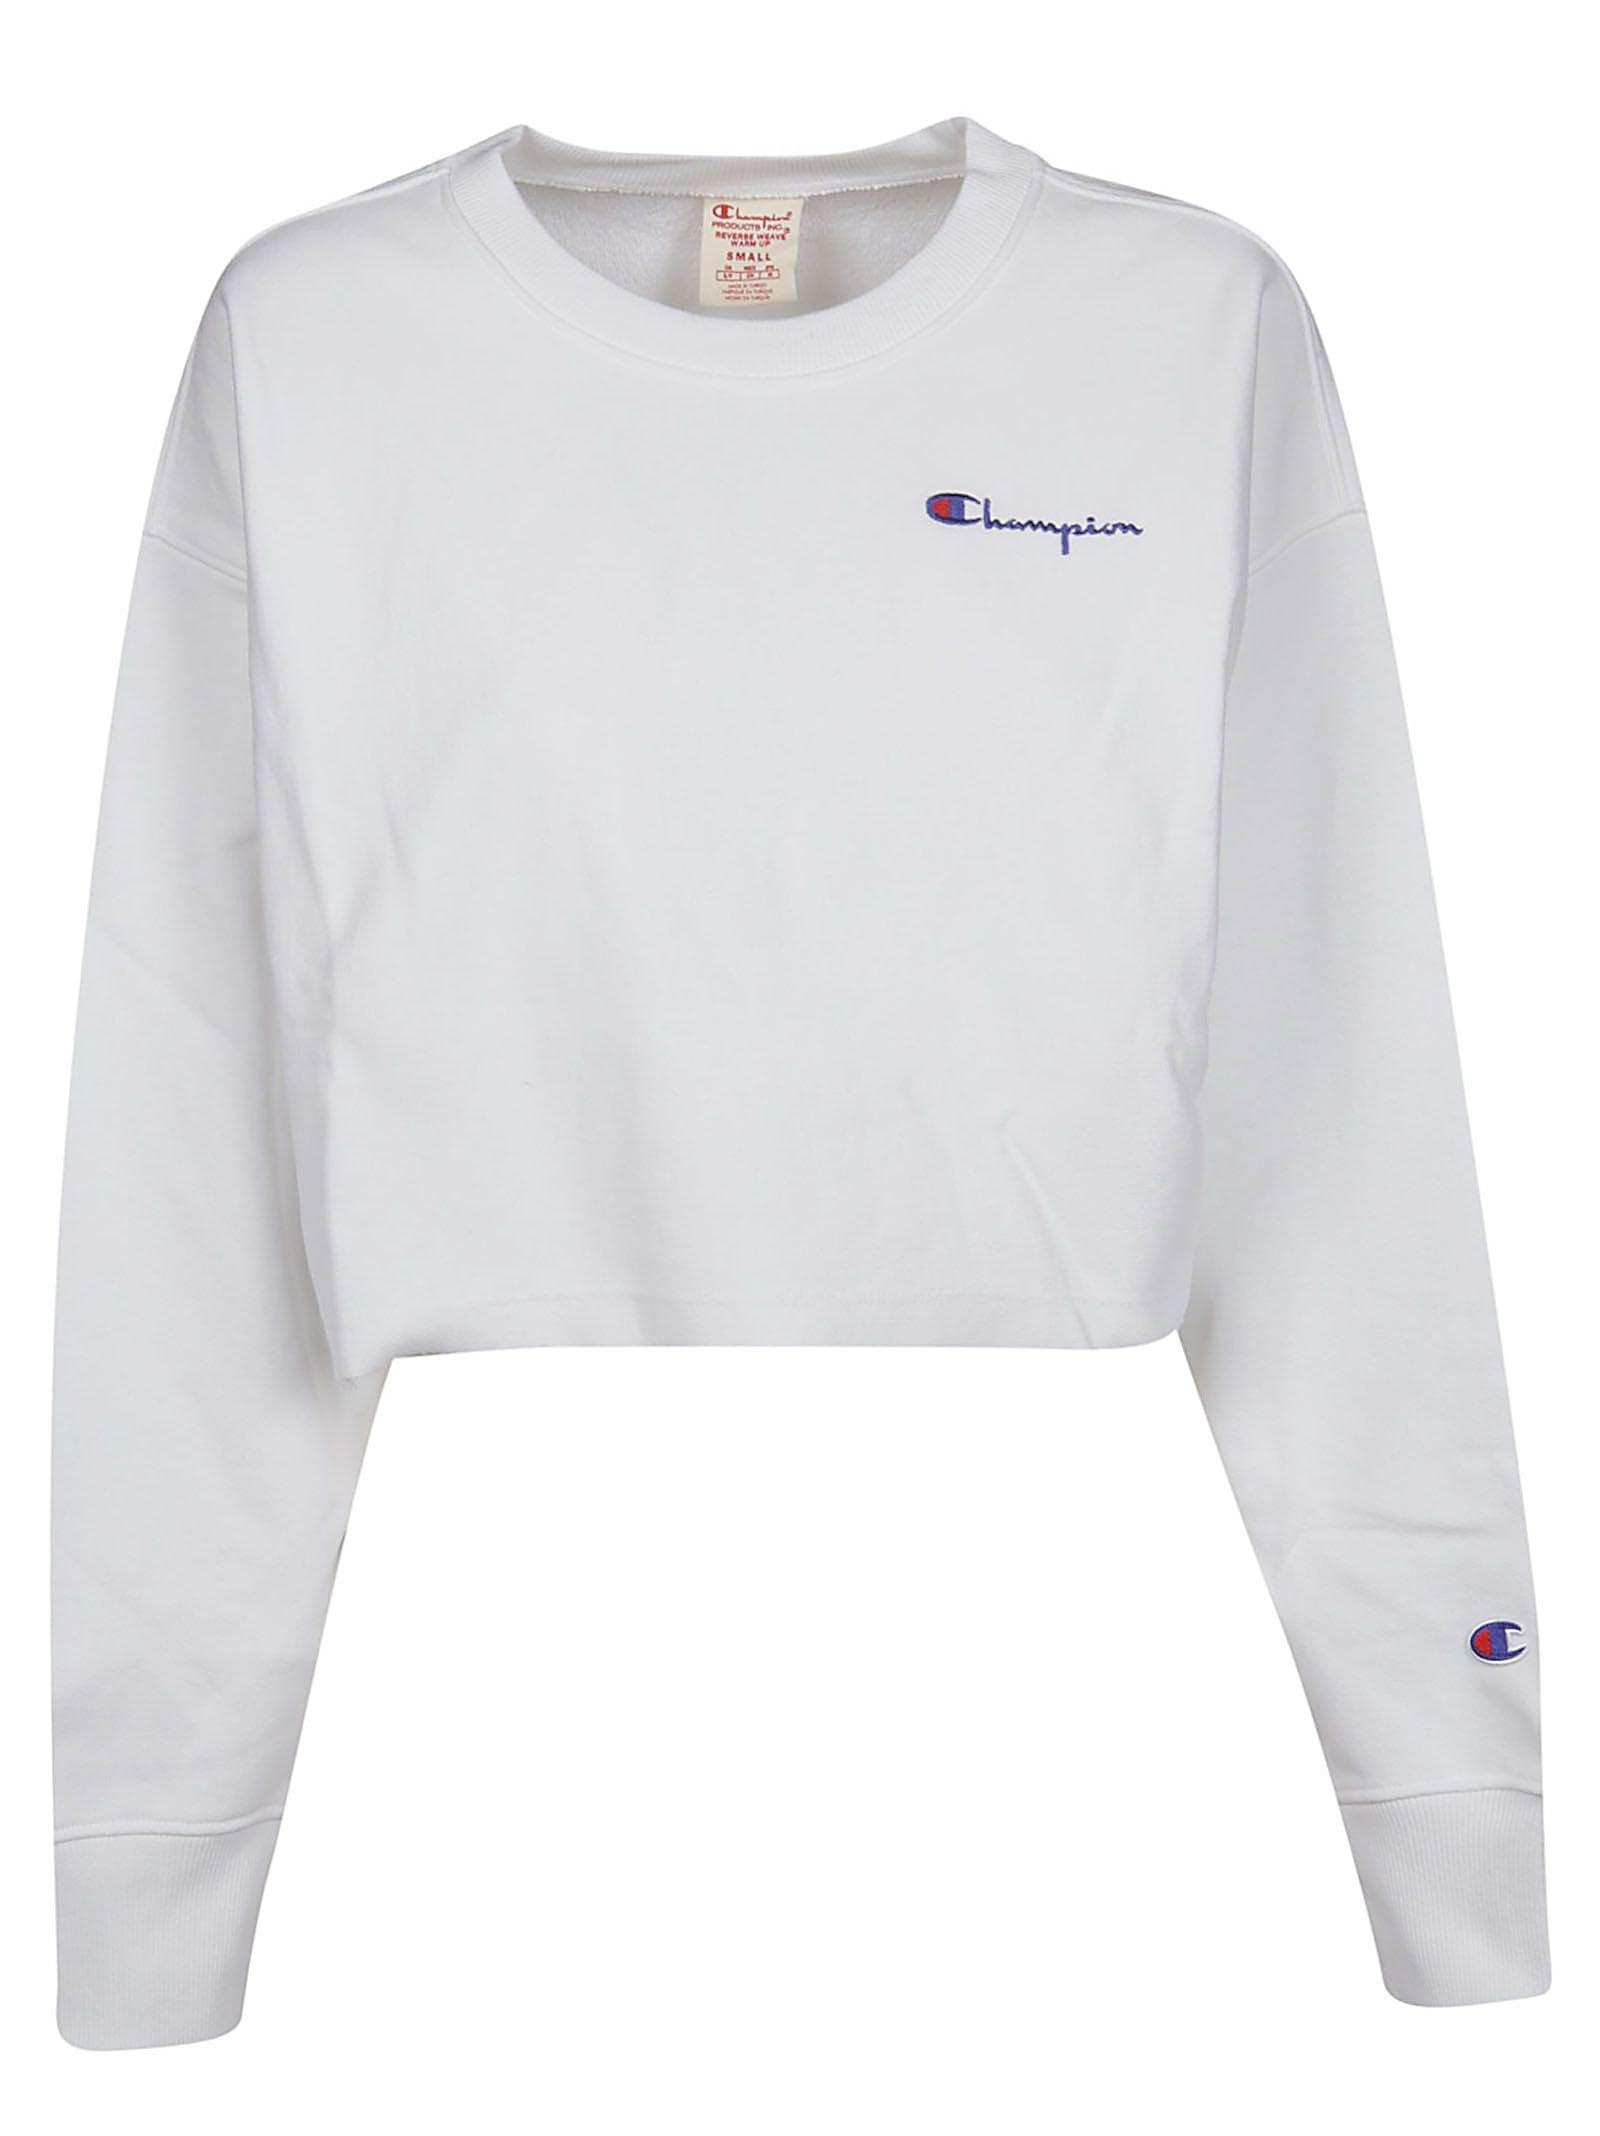 Champion Logo Embroidered Cropped Sweatshirt